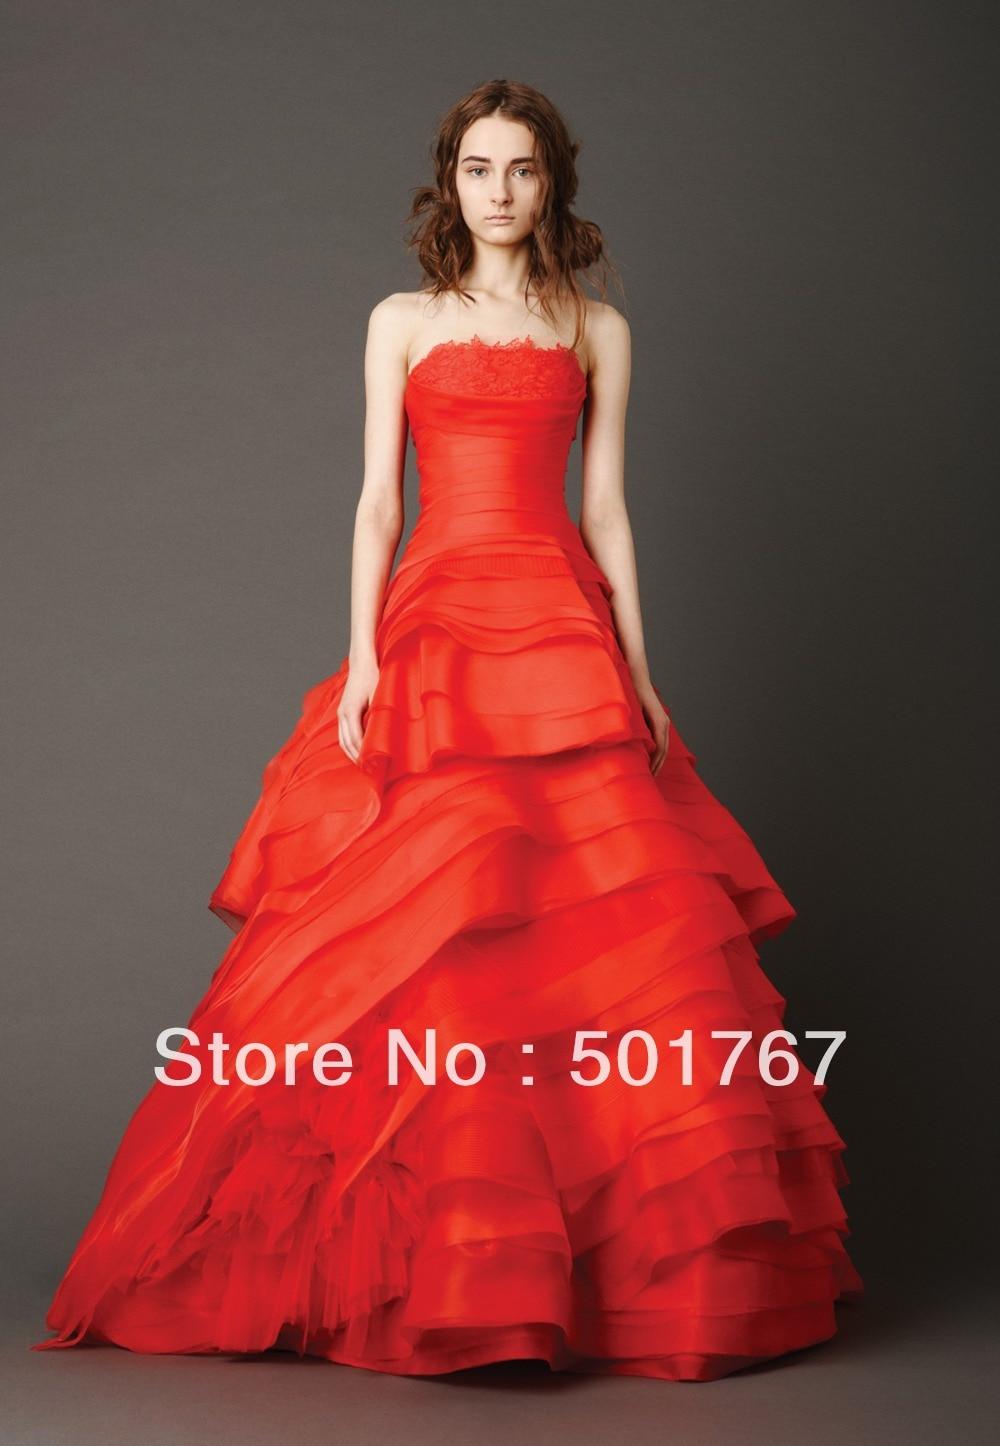 Model Dress 2014